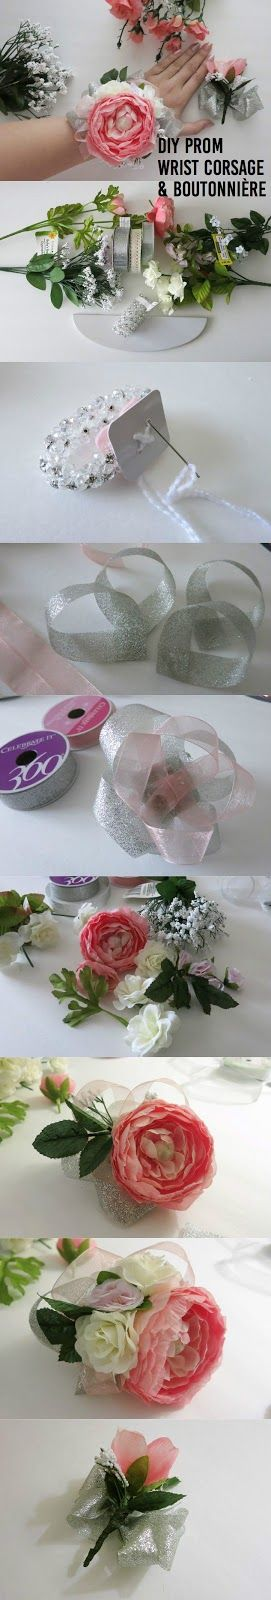 Vibrant Vantage DIY Prom Wrist Corsage Boutonniere